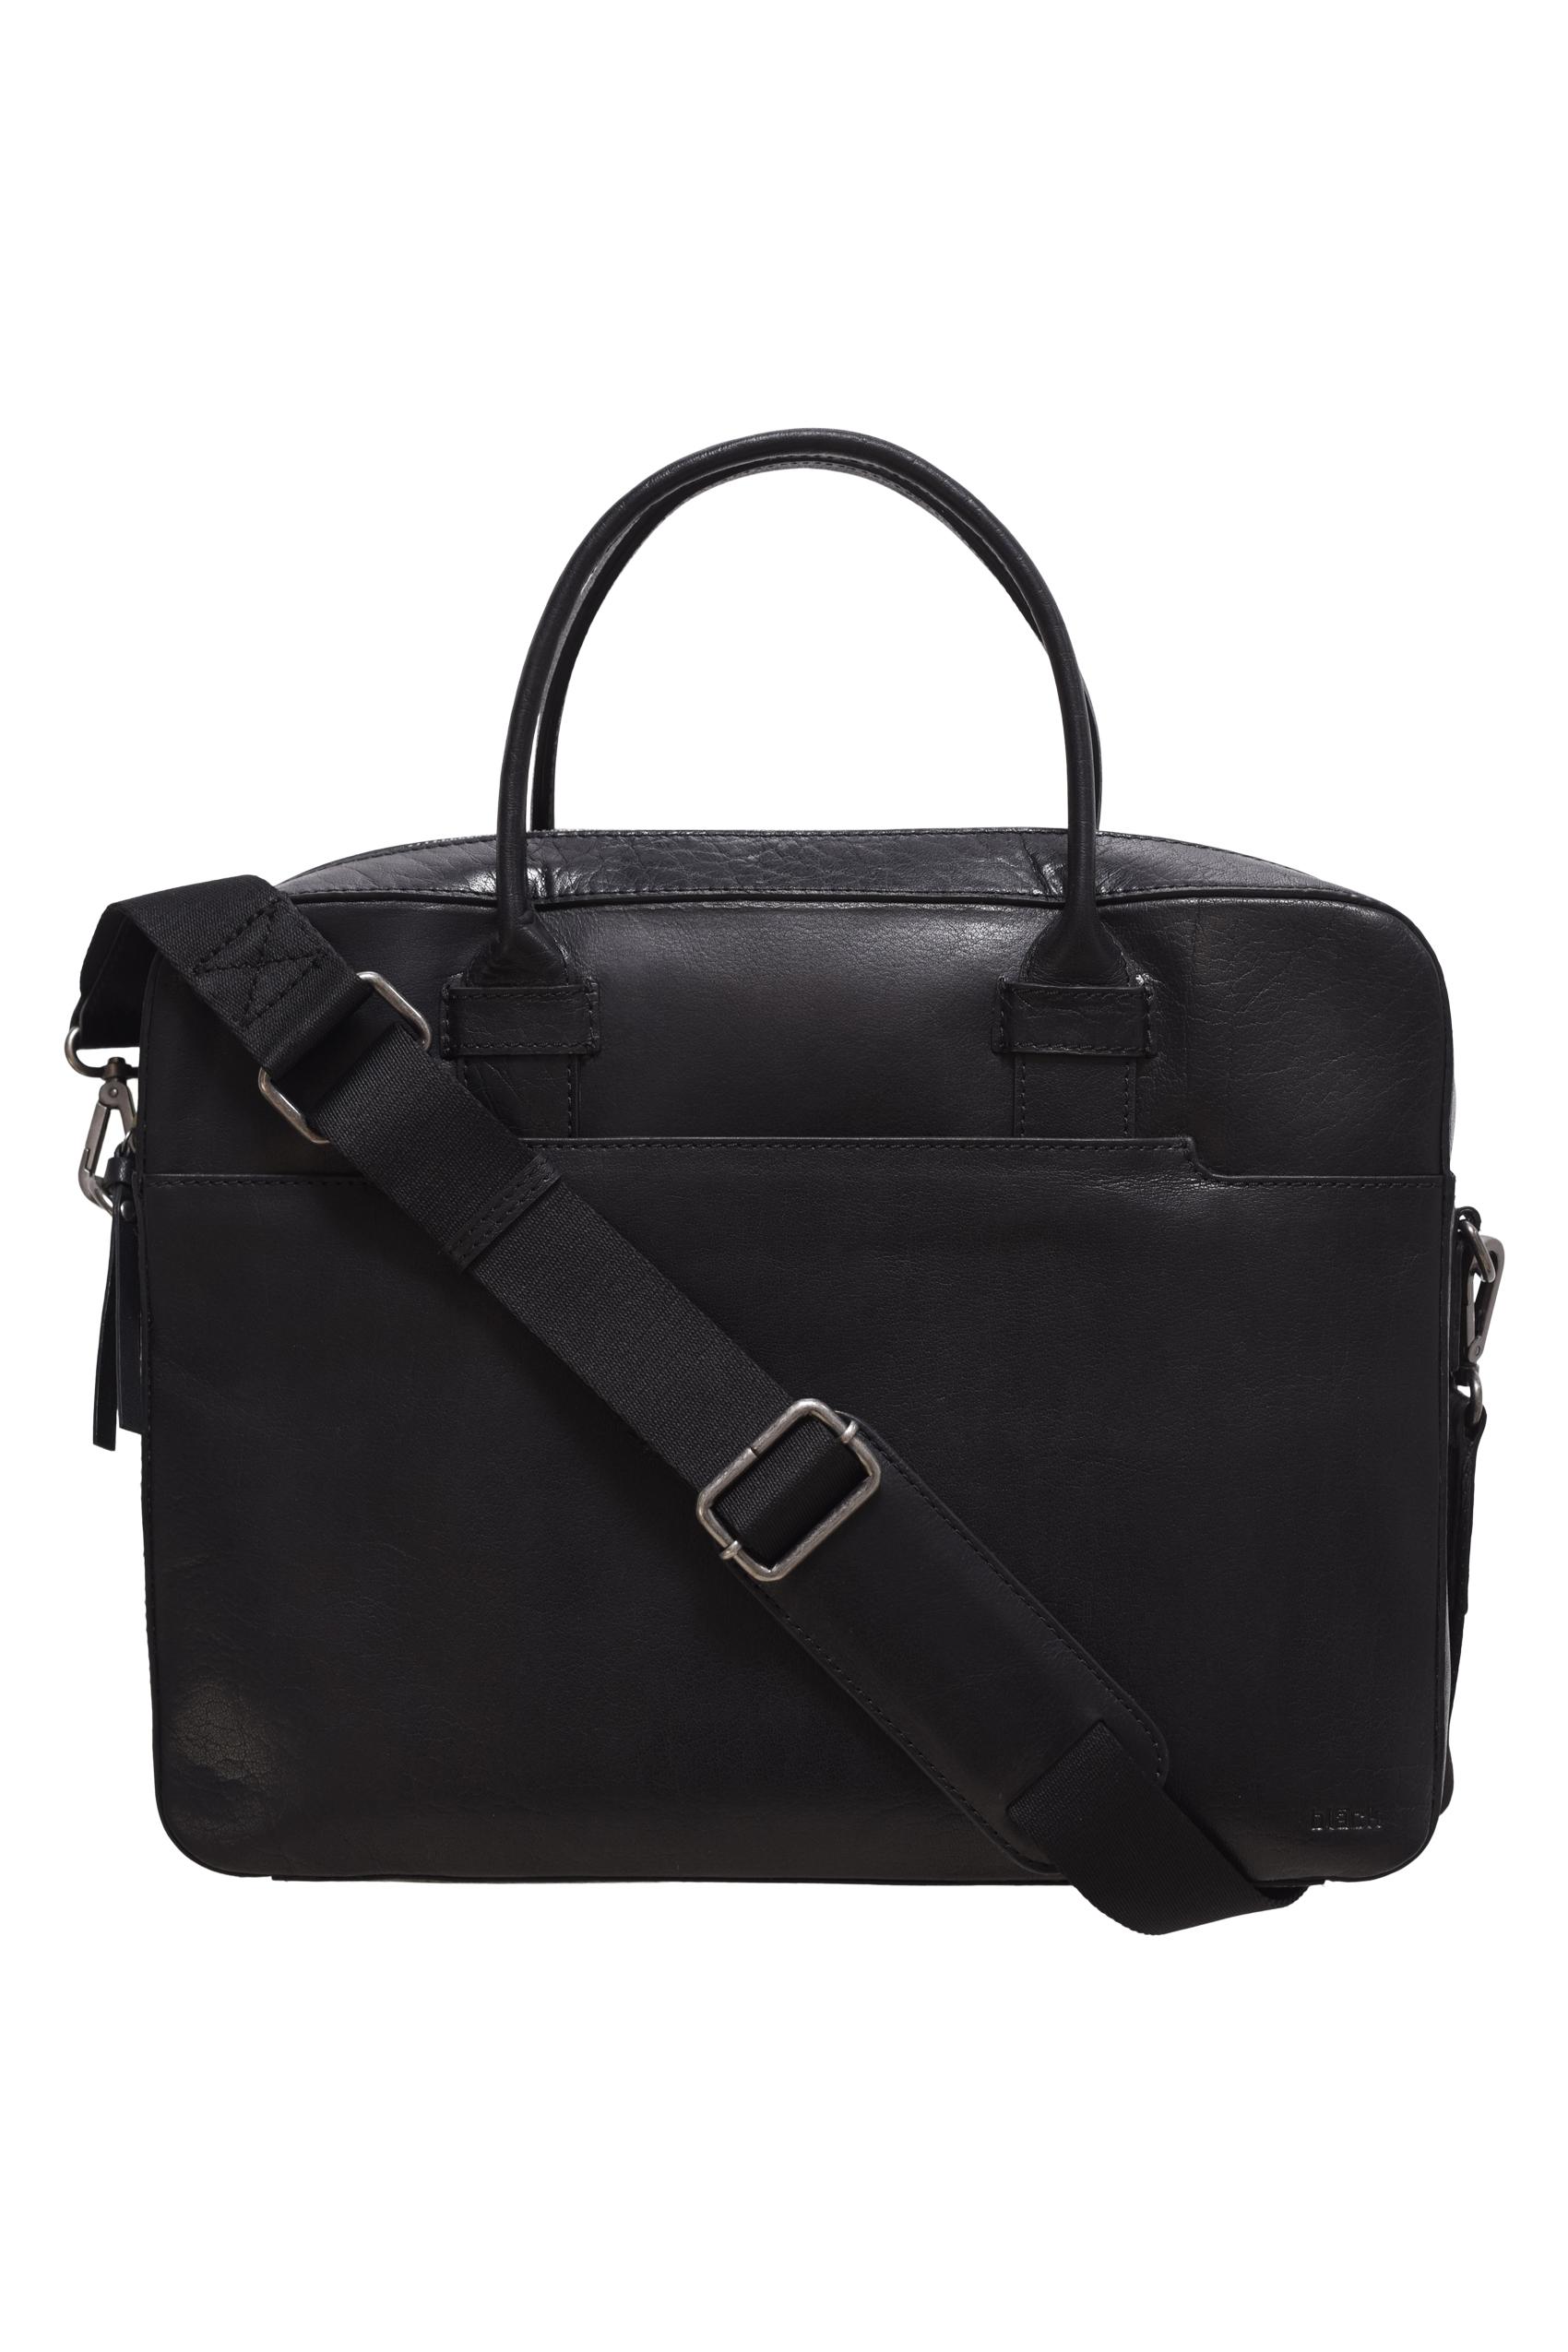 Pier briefcase